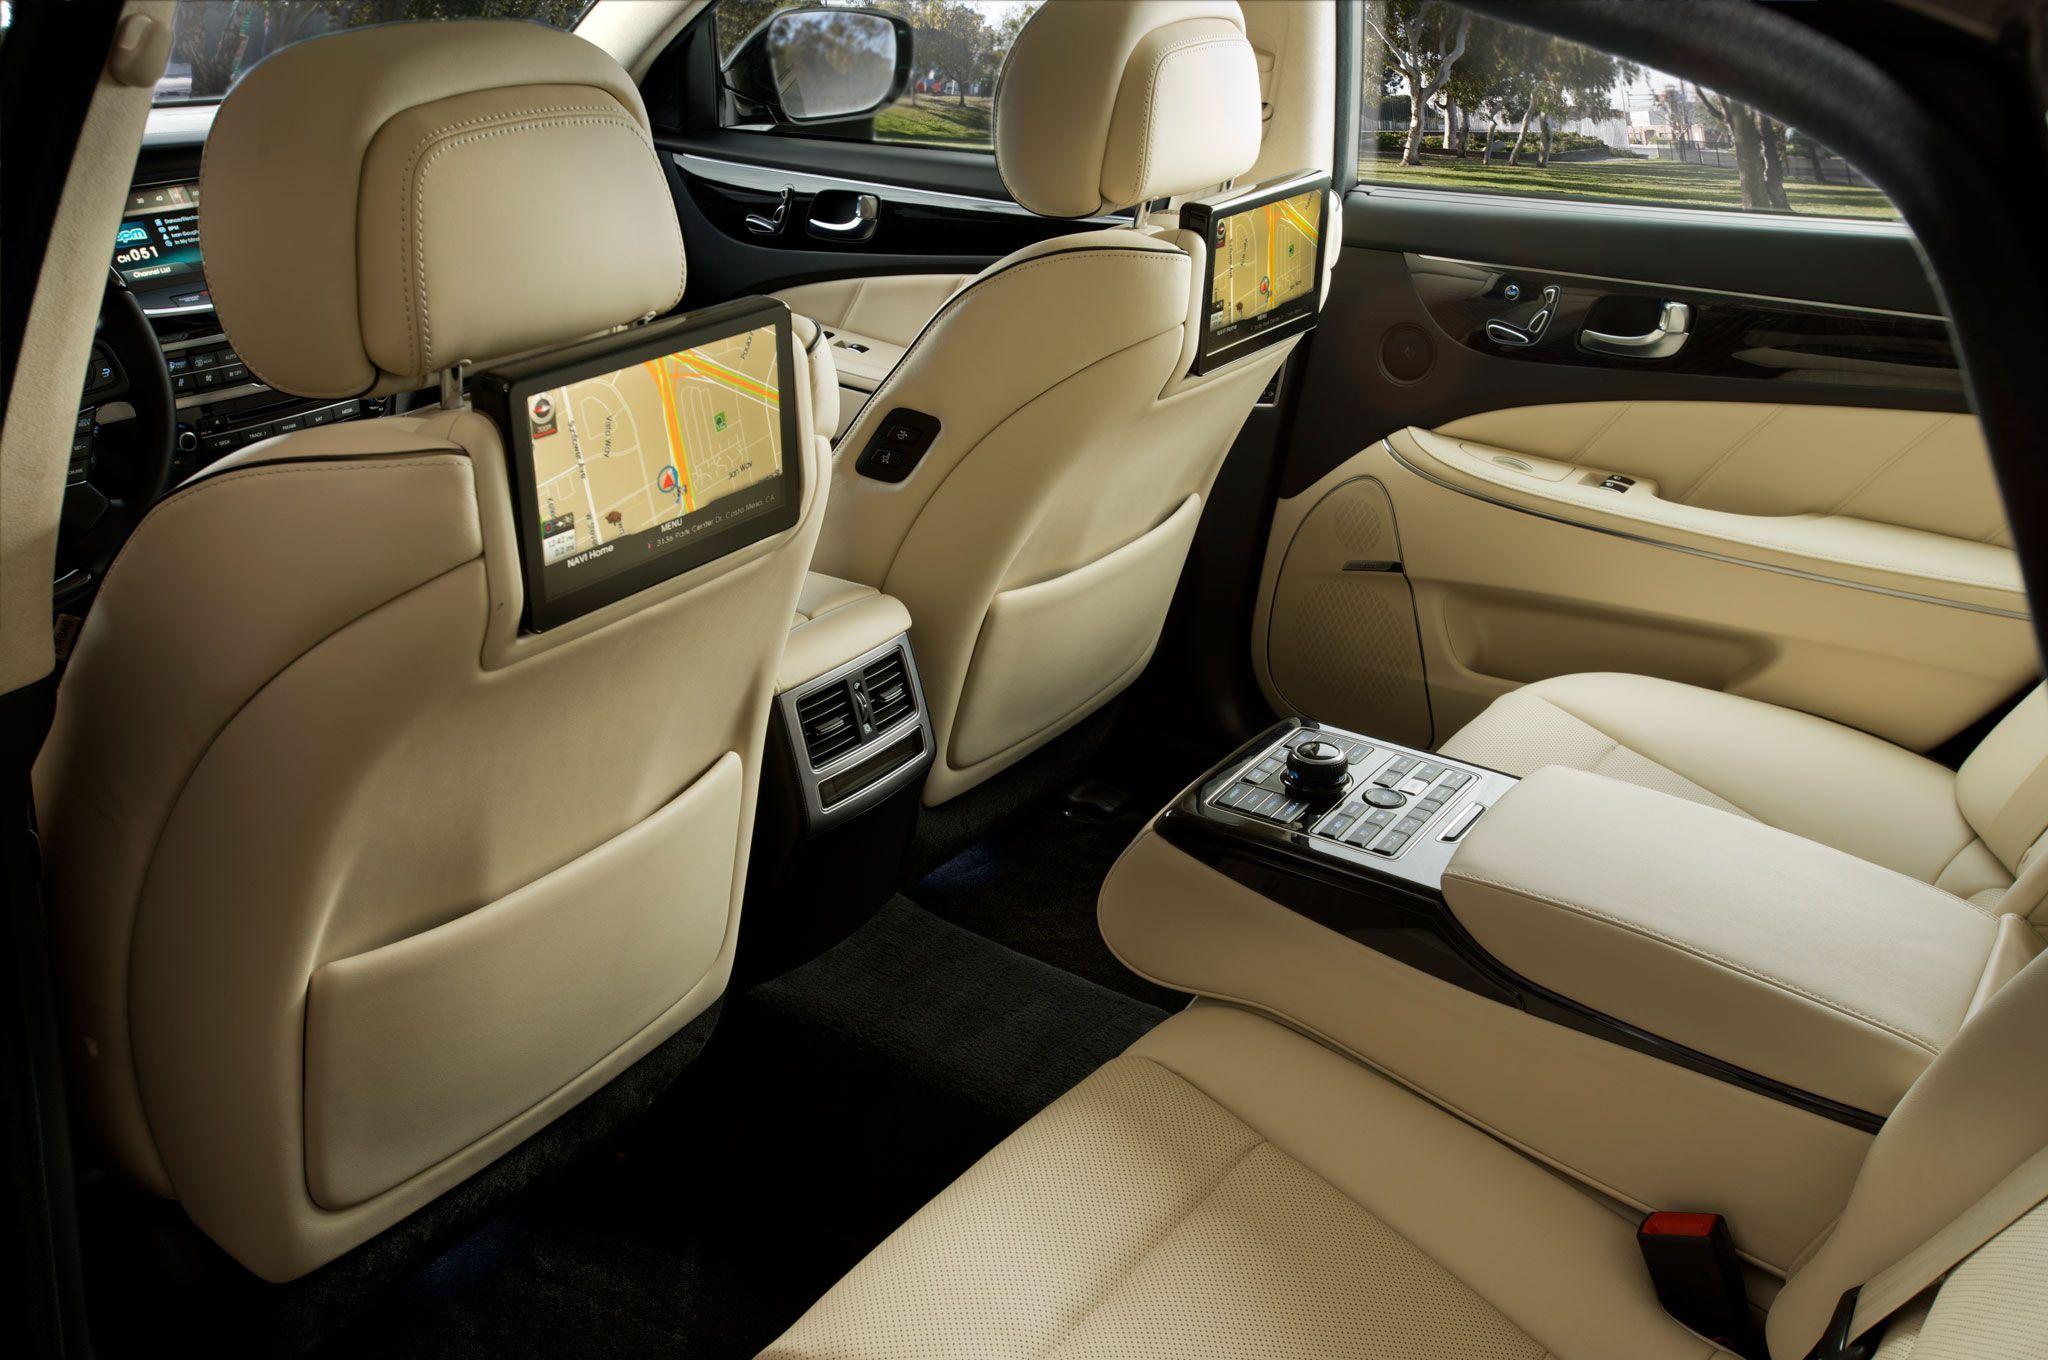 2014 Hyundai Equus Priced At 61 920 1750 Over 2013 Model Hyundai Hyundai Cars High End Cars